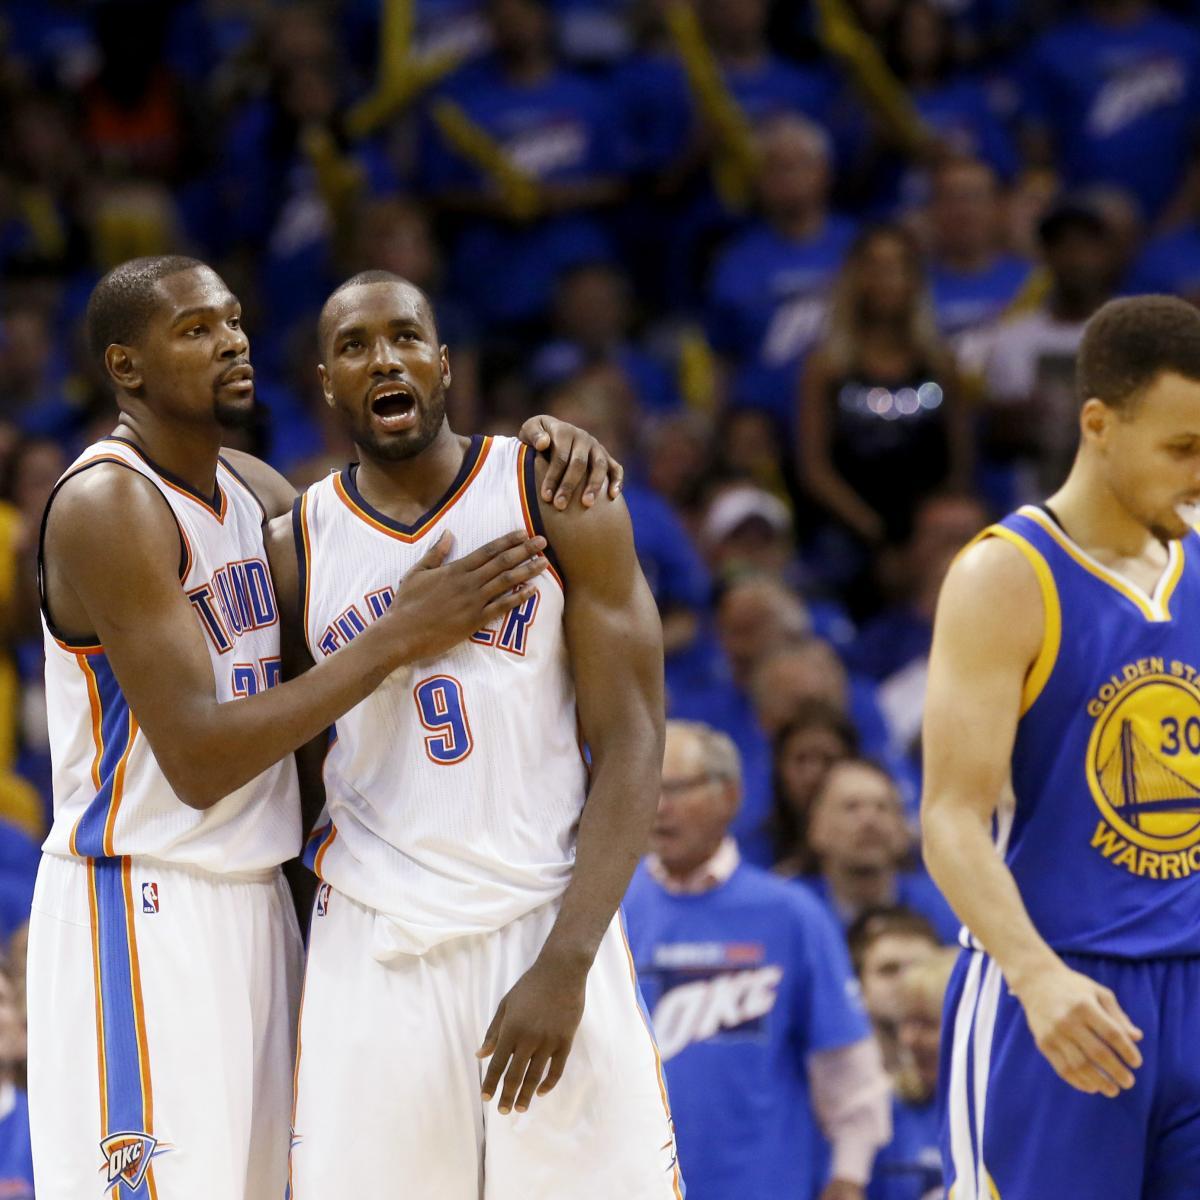 Golden State Warriors Vs Wizards Full Game Highlights: Warriors Vs. Thunder: Game 3 Video Highlights And Recap